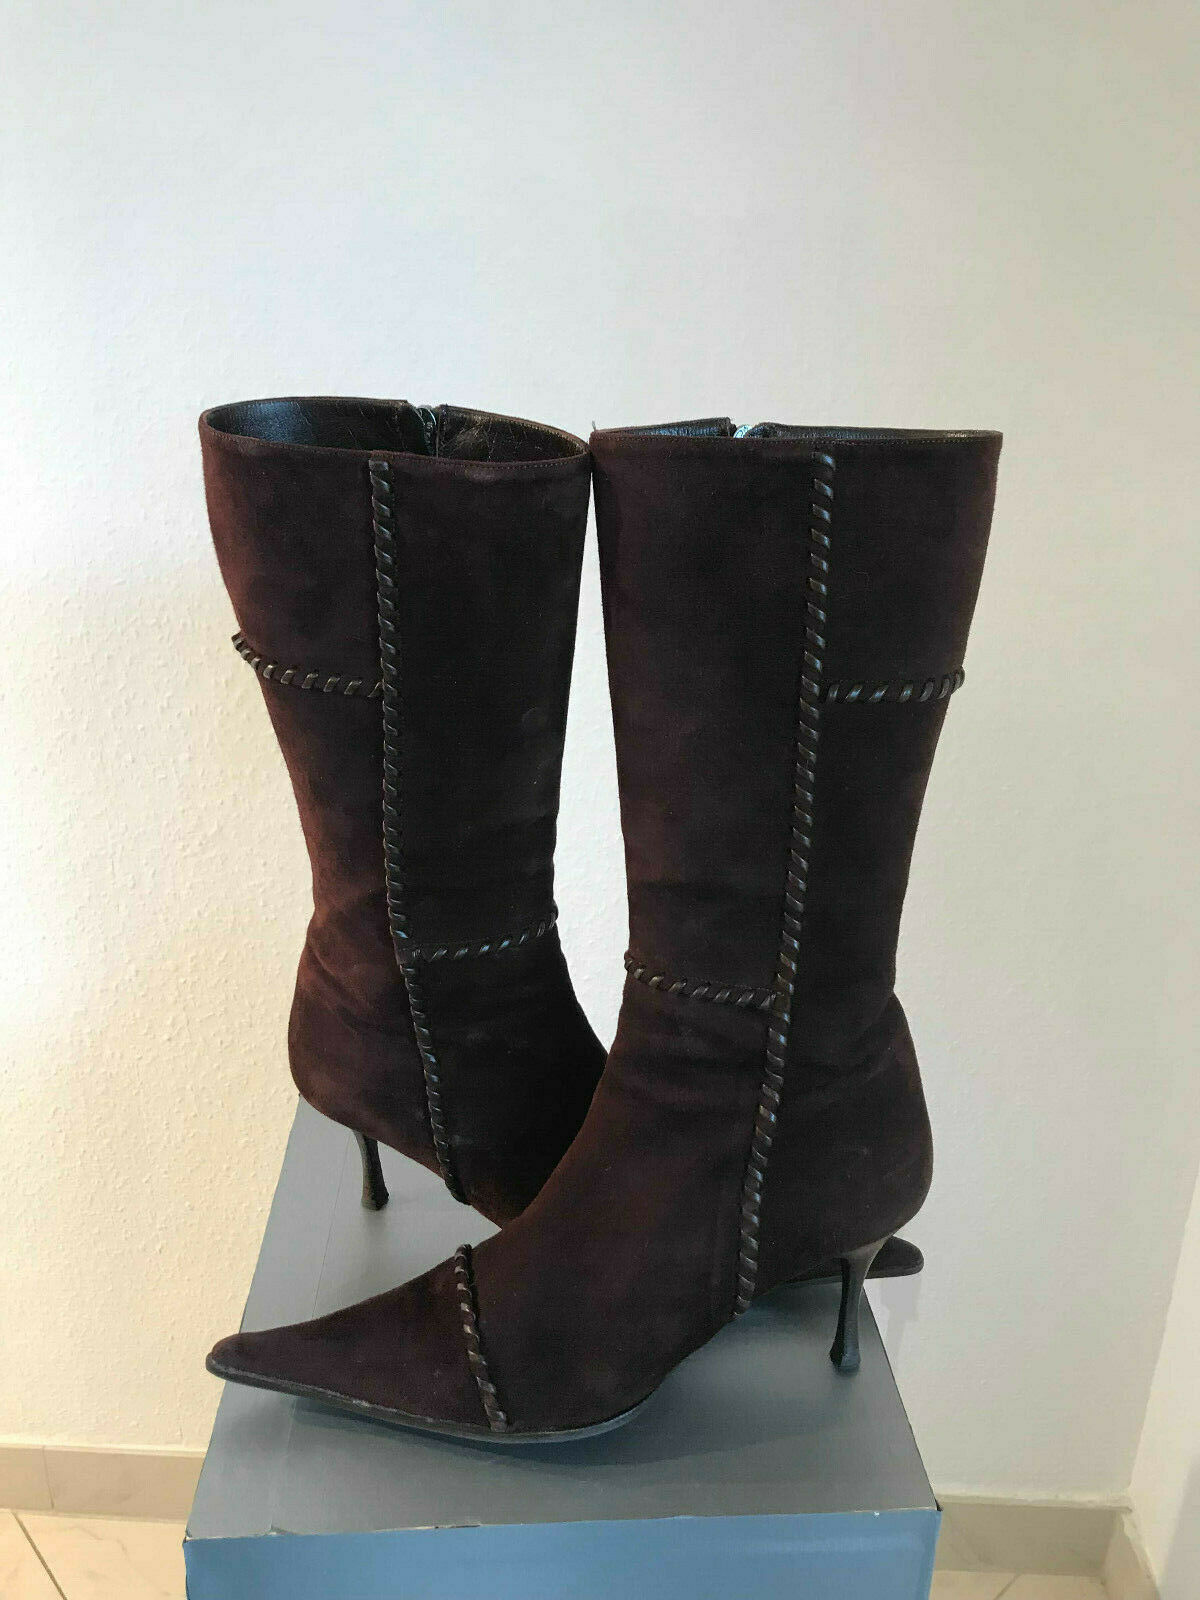 Designer Damen Stiefel Sergio Rossi Gr. 39 dunkel brau Veloursleder